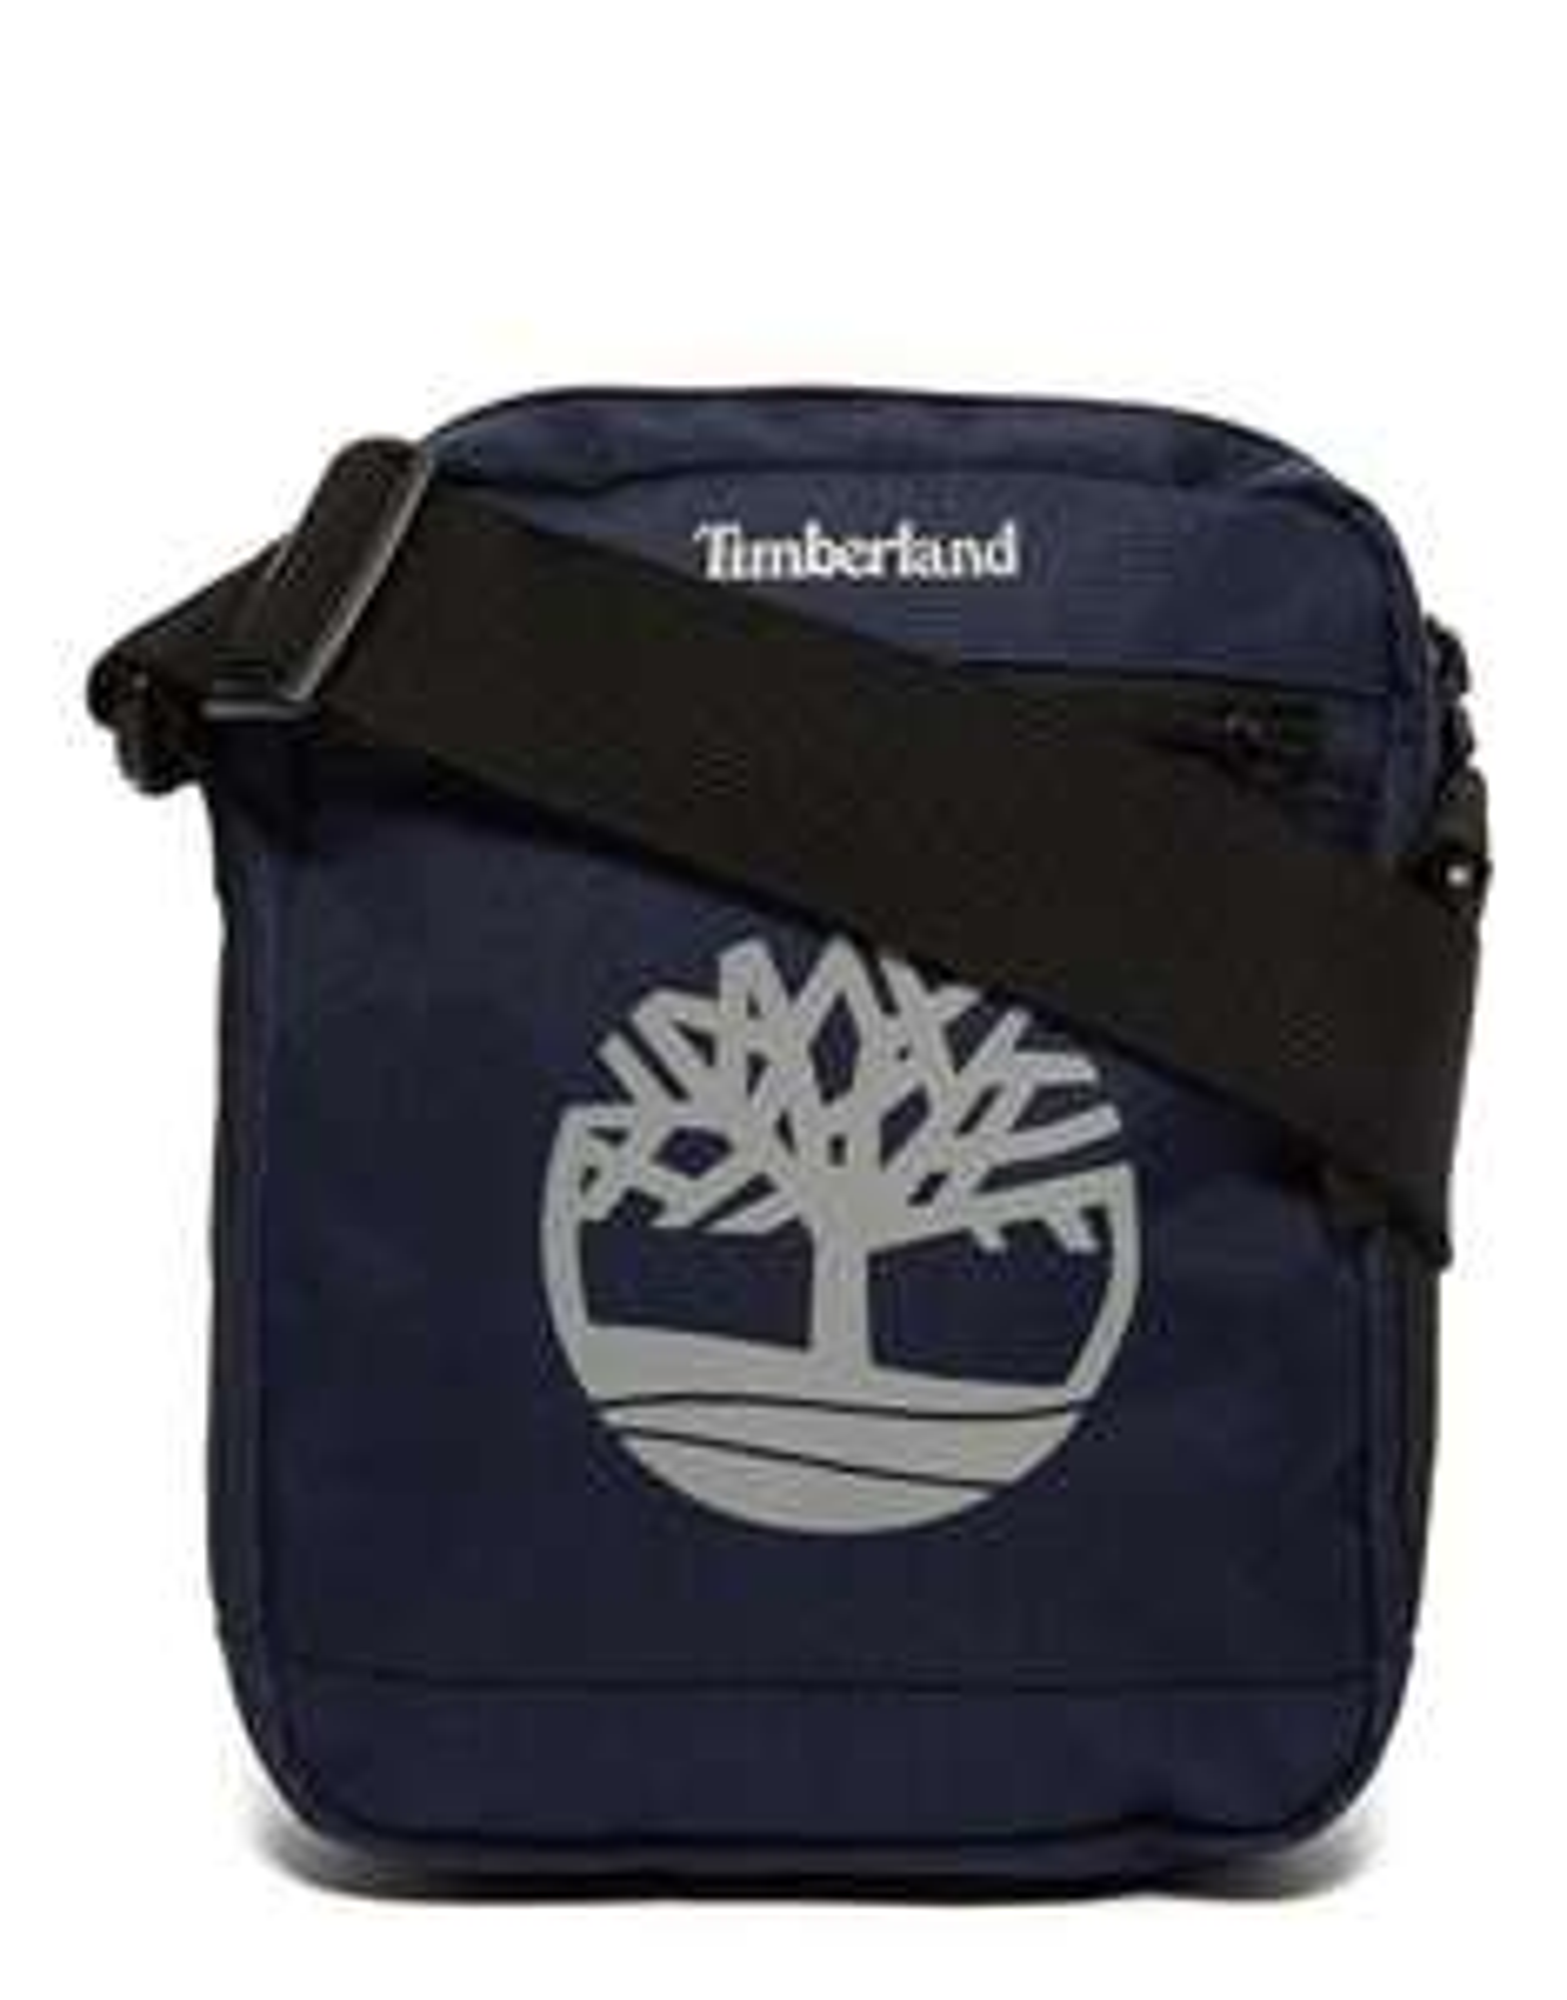 Sélection de sacoches bandoulières à 1€ - Ex : Sacoche Timberland Small Items Bag (Noir ou Bleu)